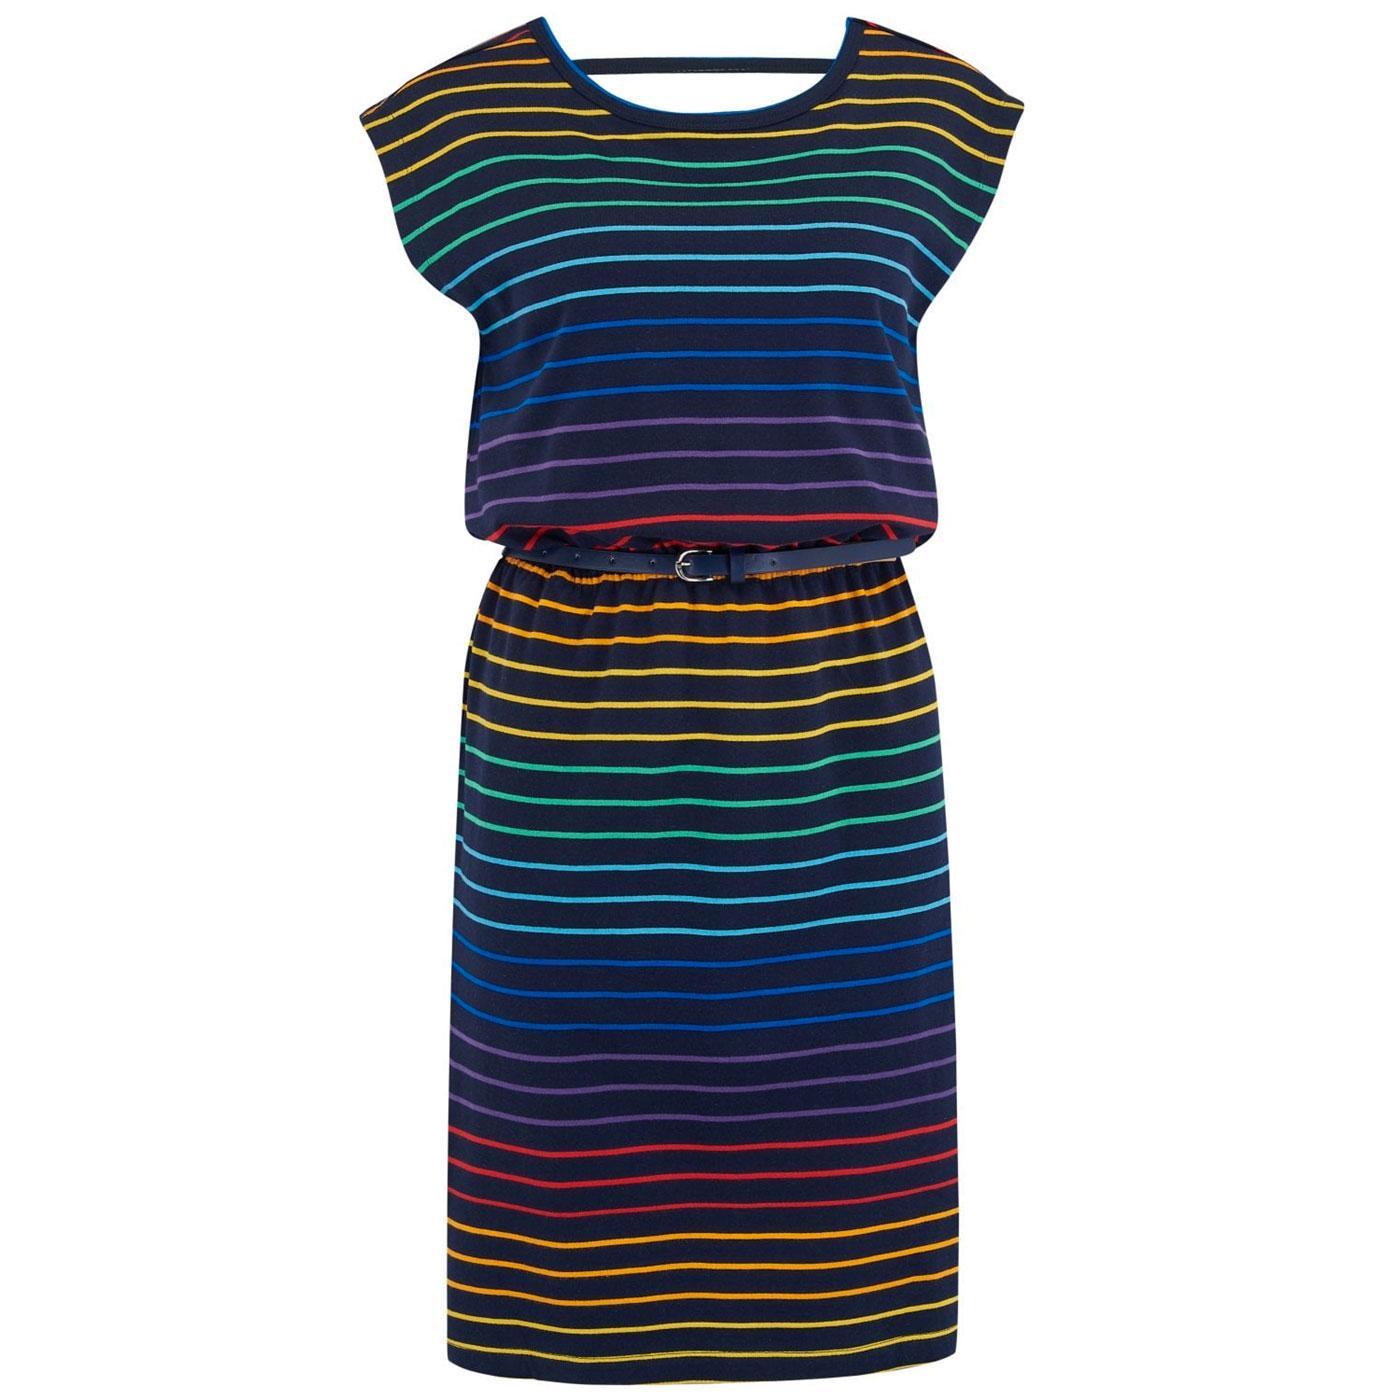 Hetty SUGARHILL BRIGHTON Retro 70s Summer Dress